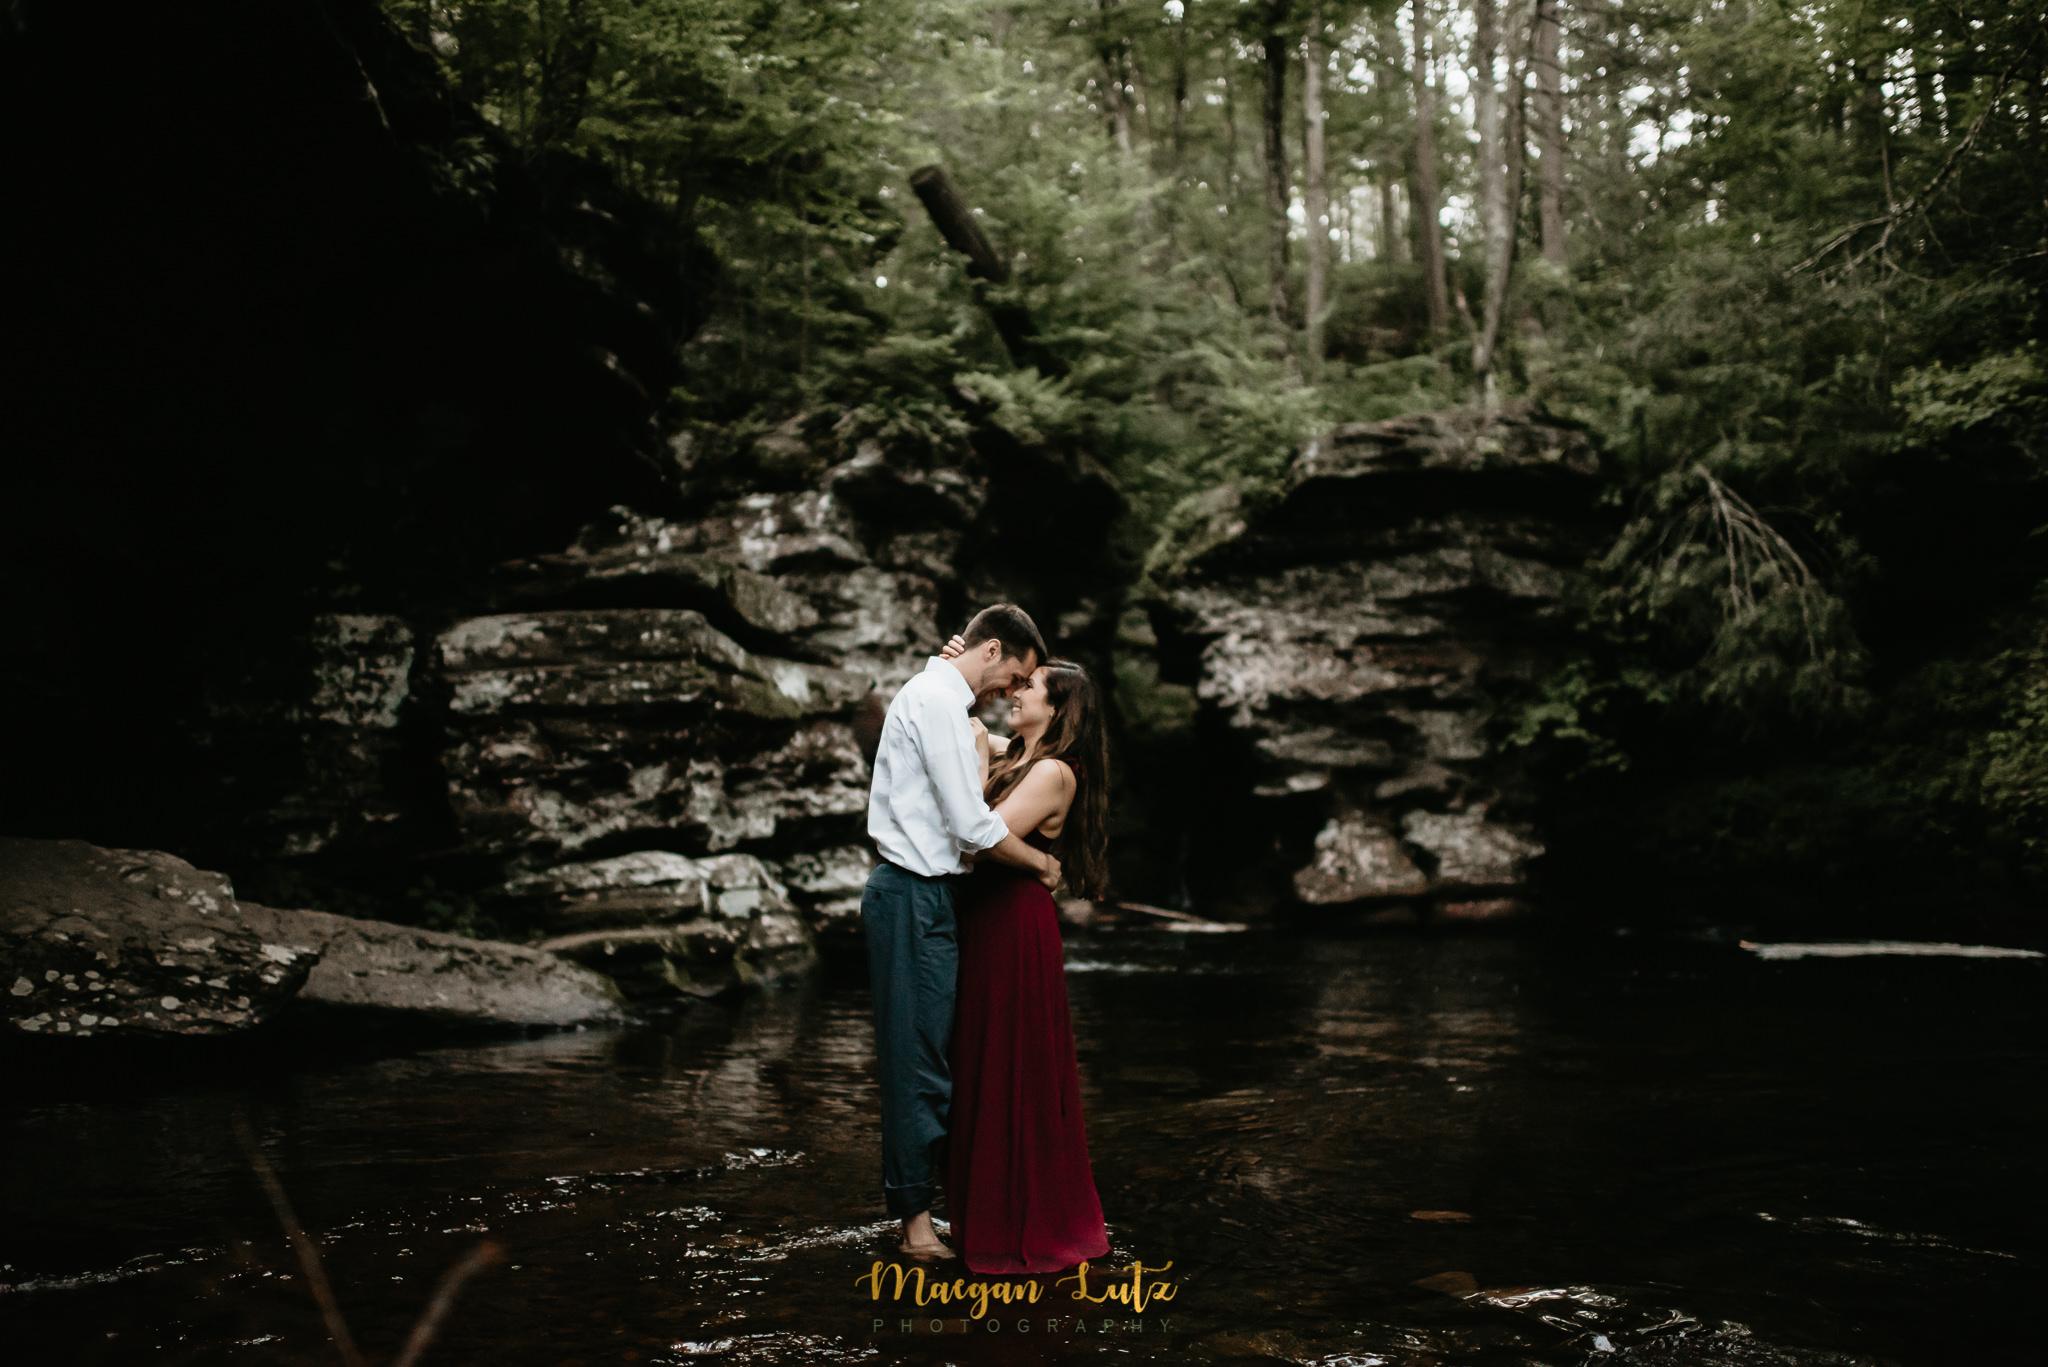 NEPA-Engagement-Wedding-Photographer-Session-at-Ricketts-Glen-State-Park-46.jpg